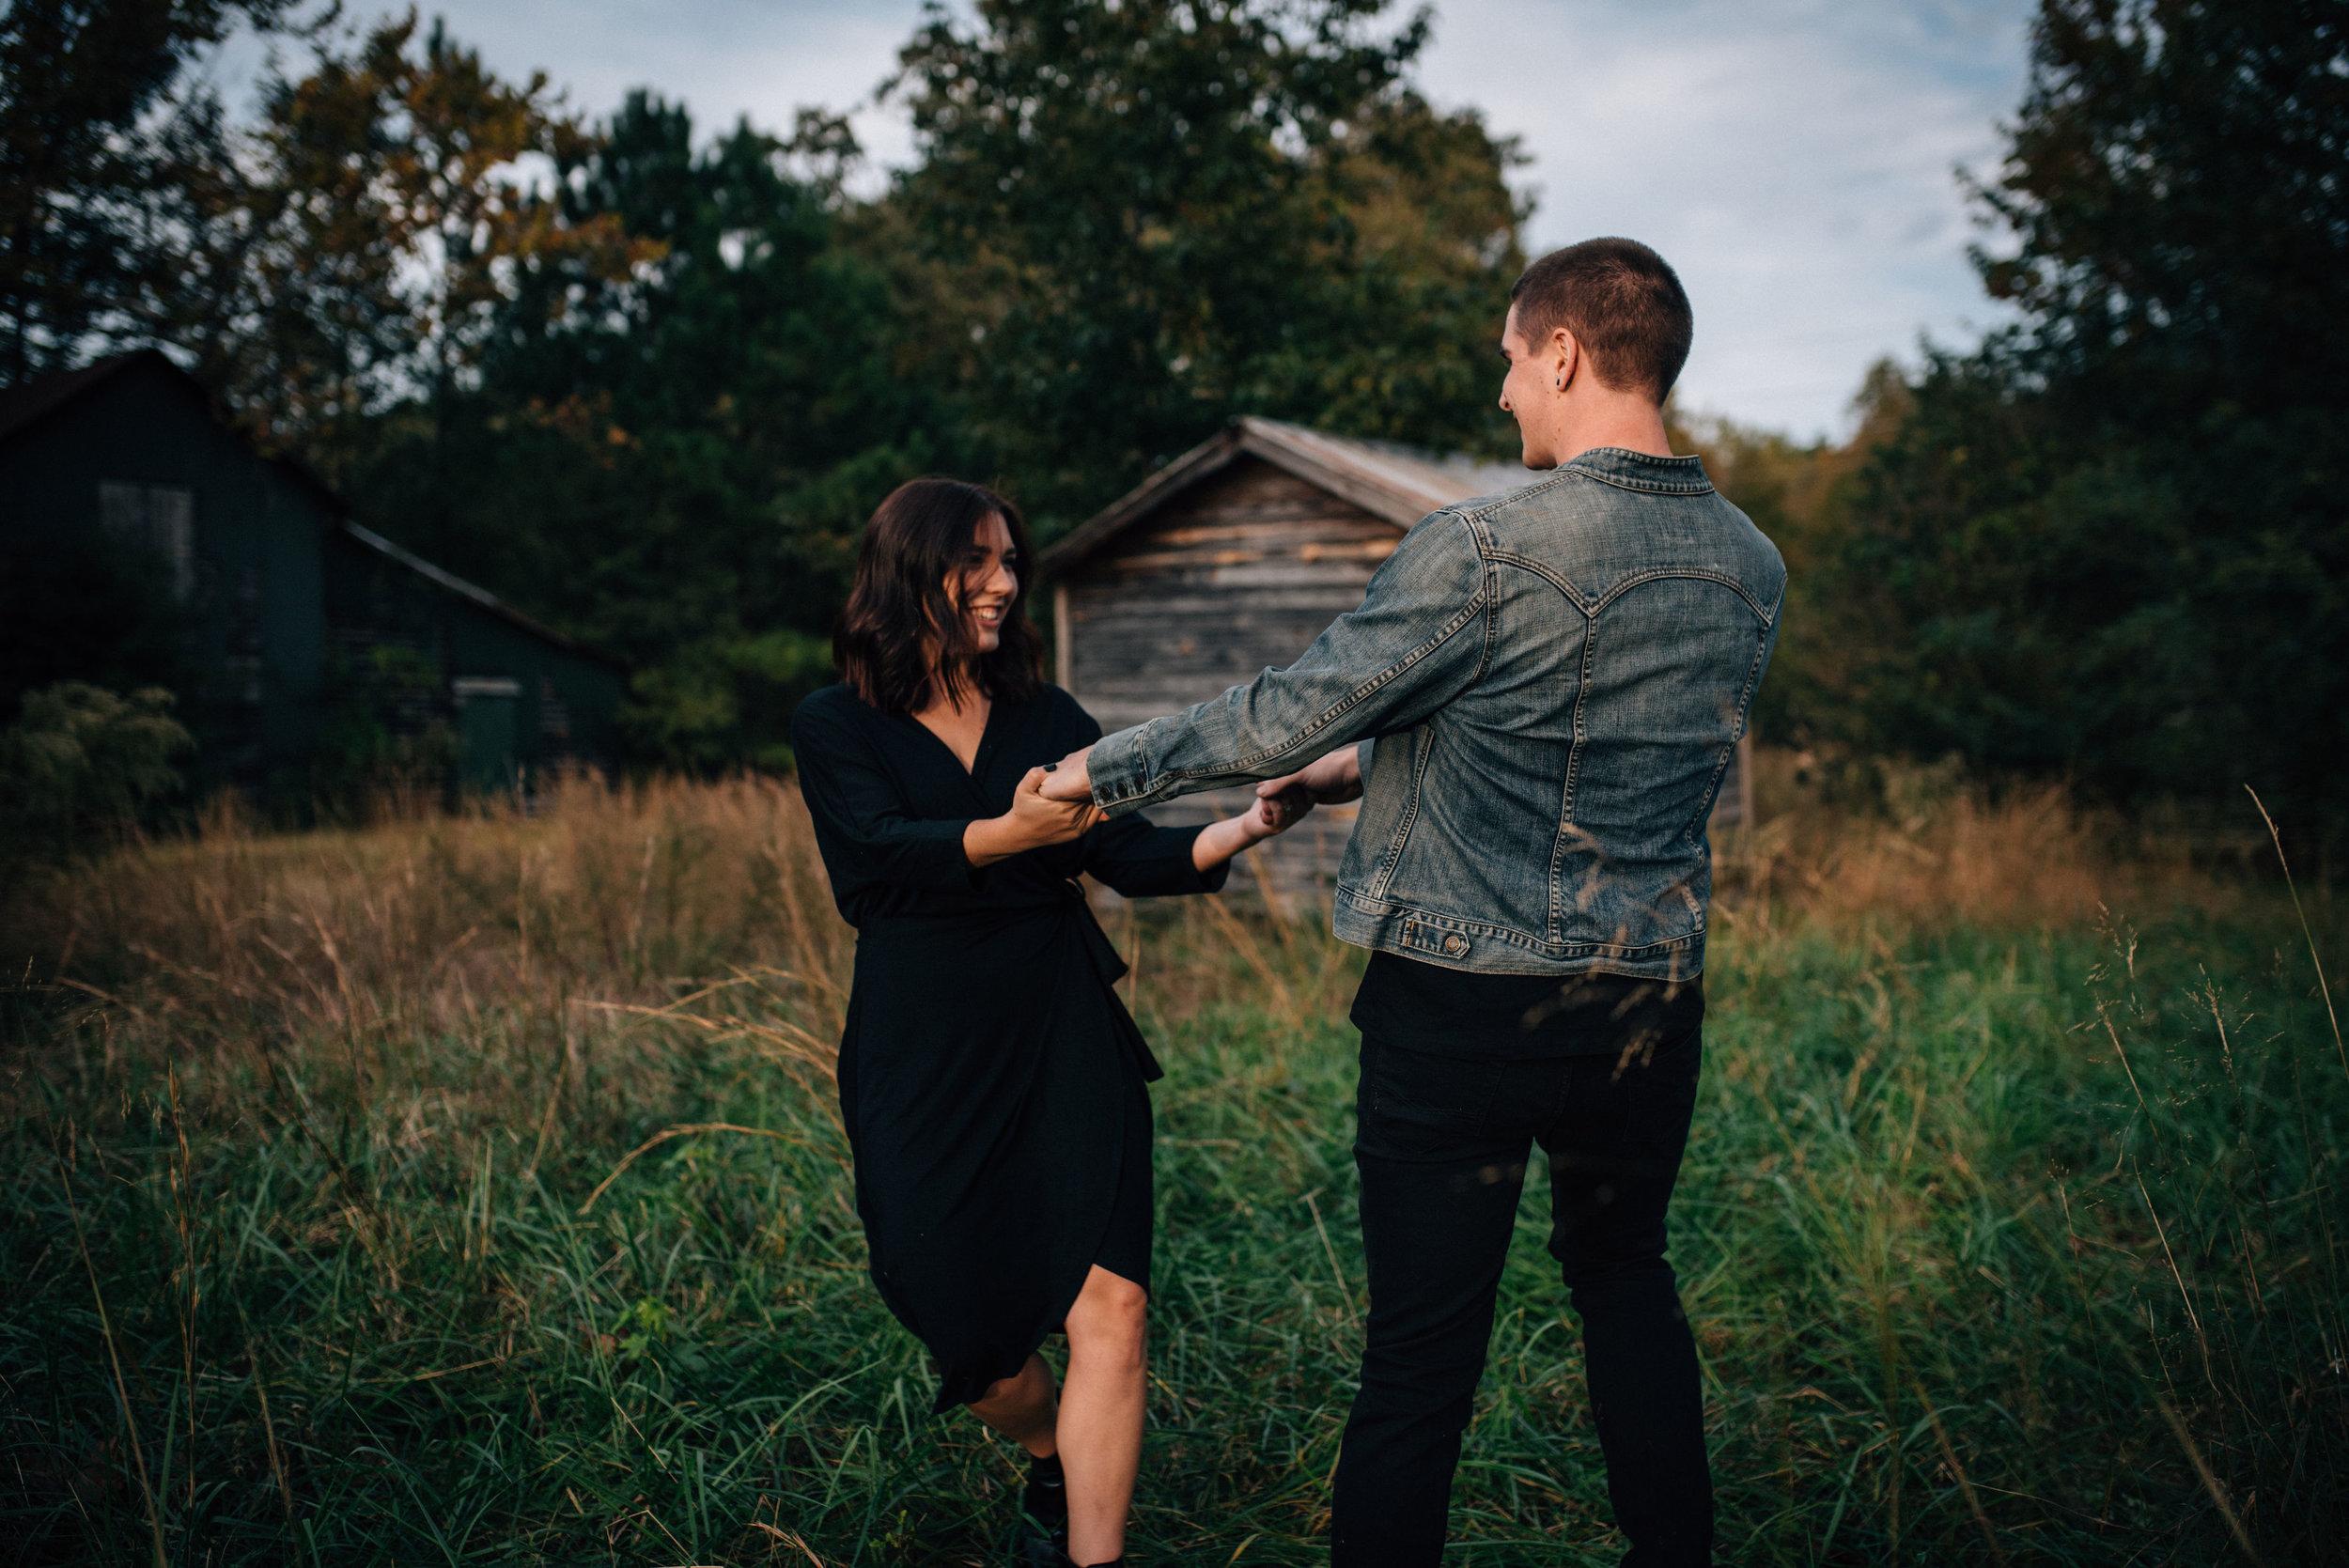 haunted halloween engagement shoot - halloween couple session - north carolina wedding photographer - raleigh wedding photographer